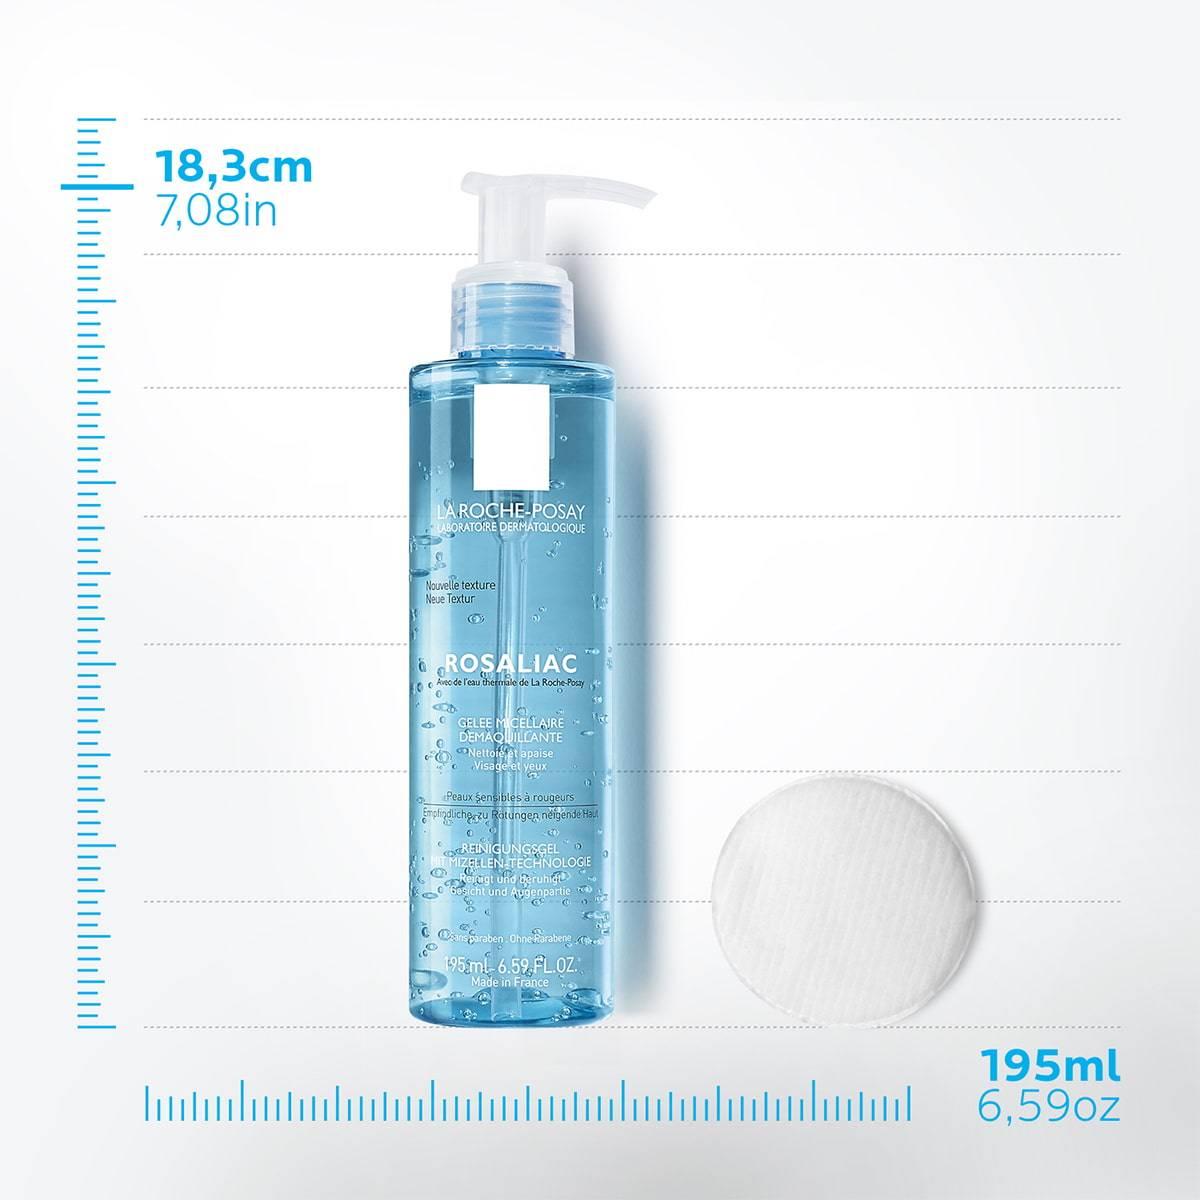 La Roche Posay Tuotesivu Face Cleanser Rosaliac Make Up Removal Gel